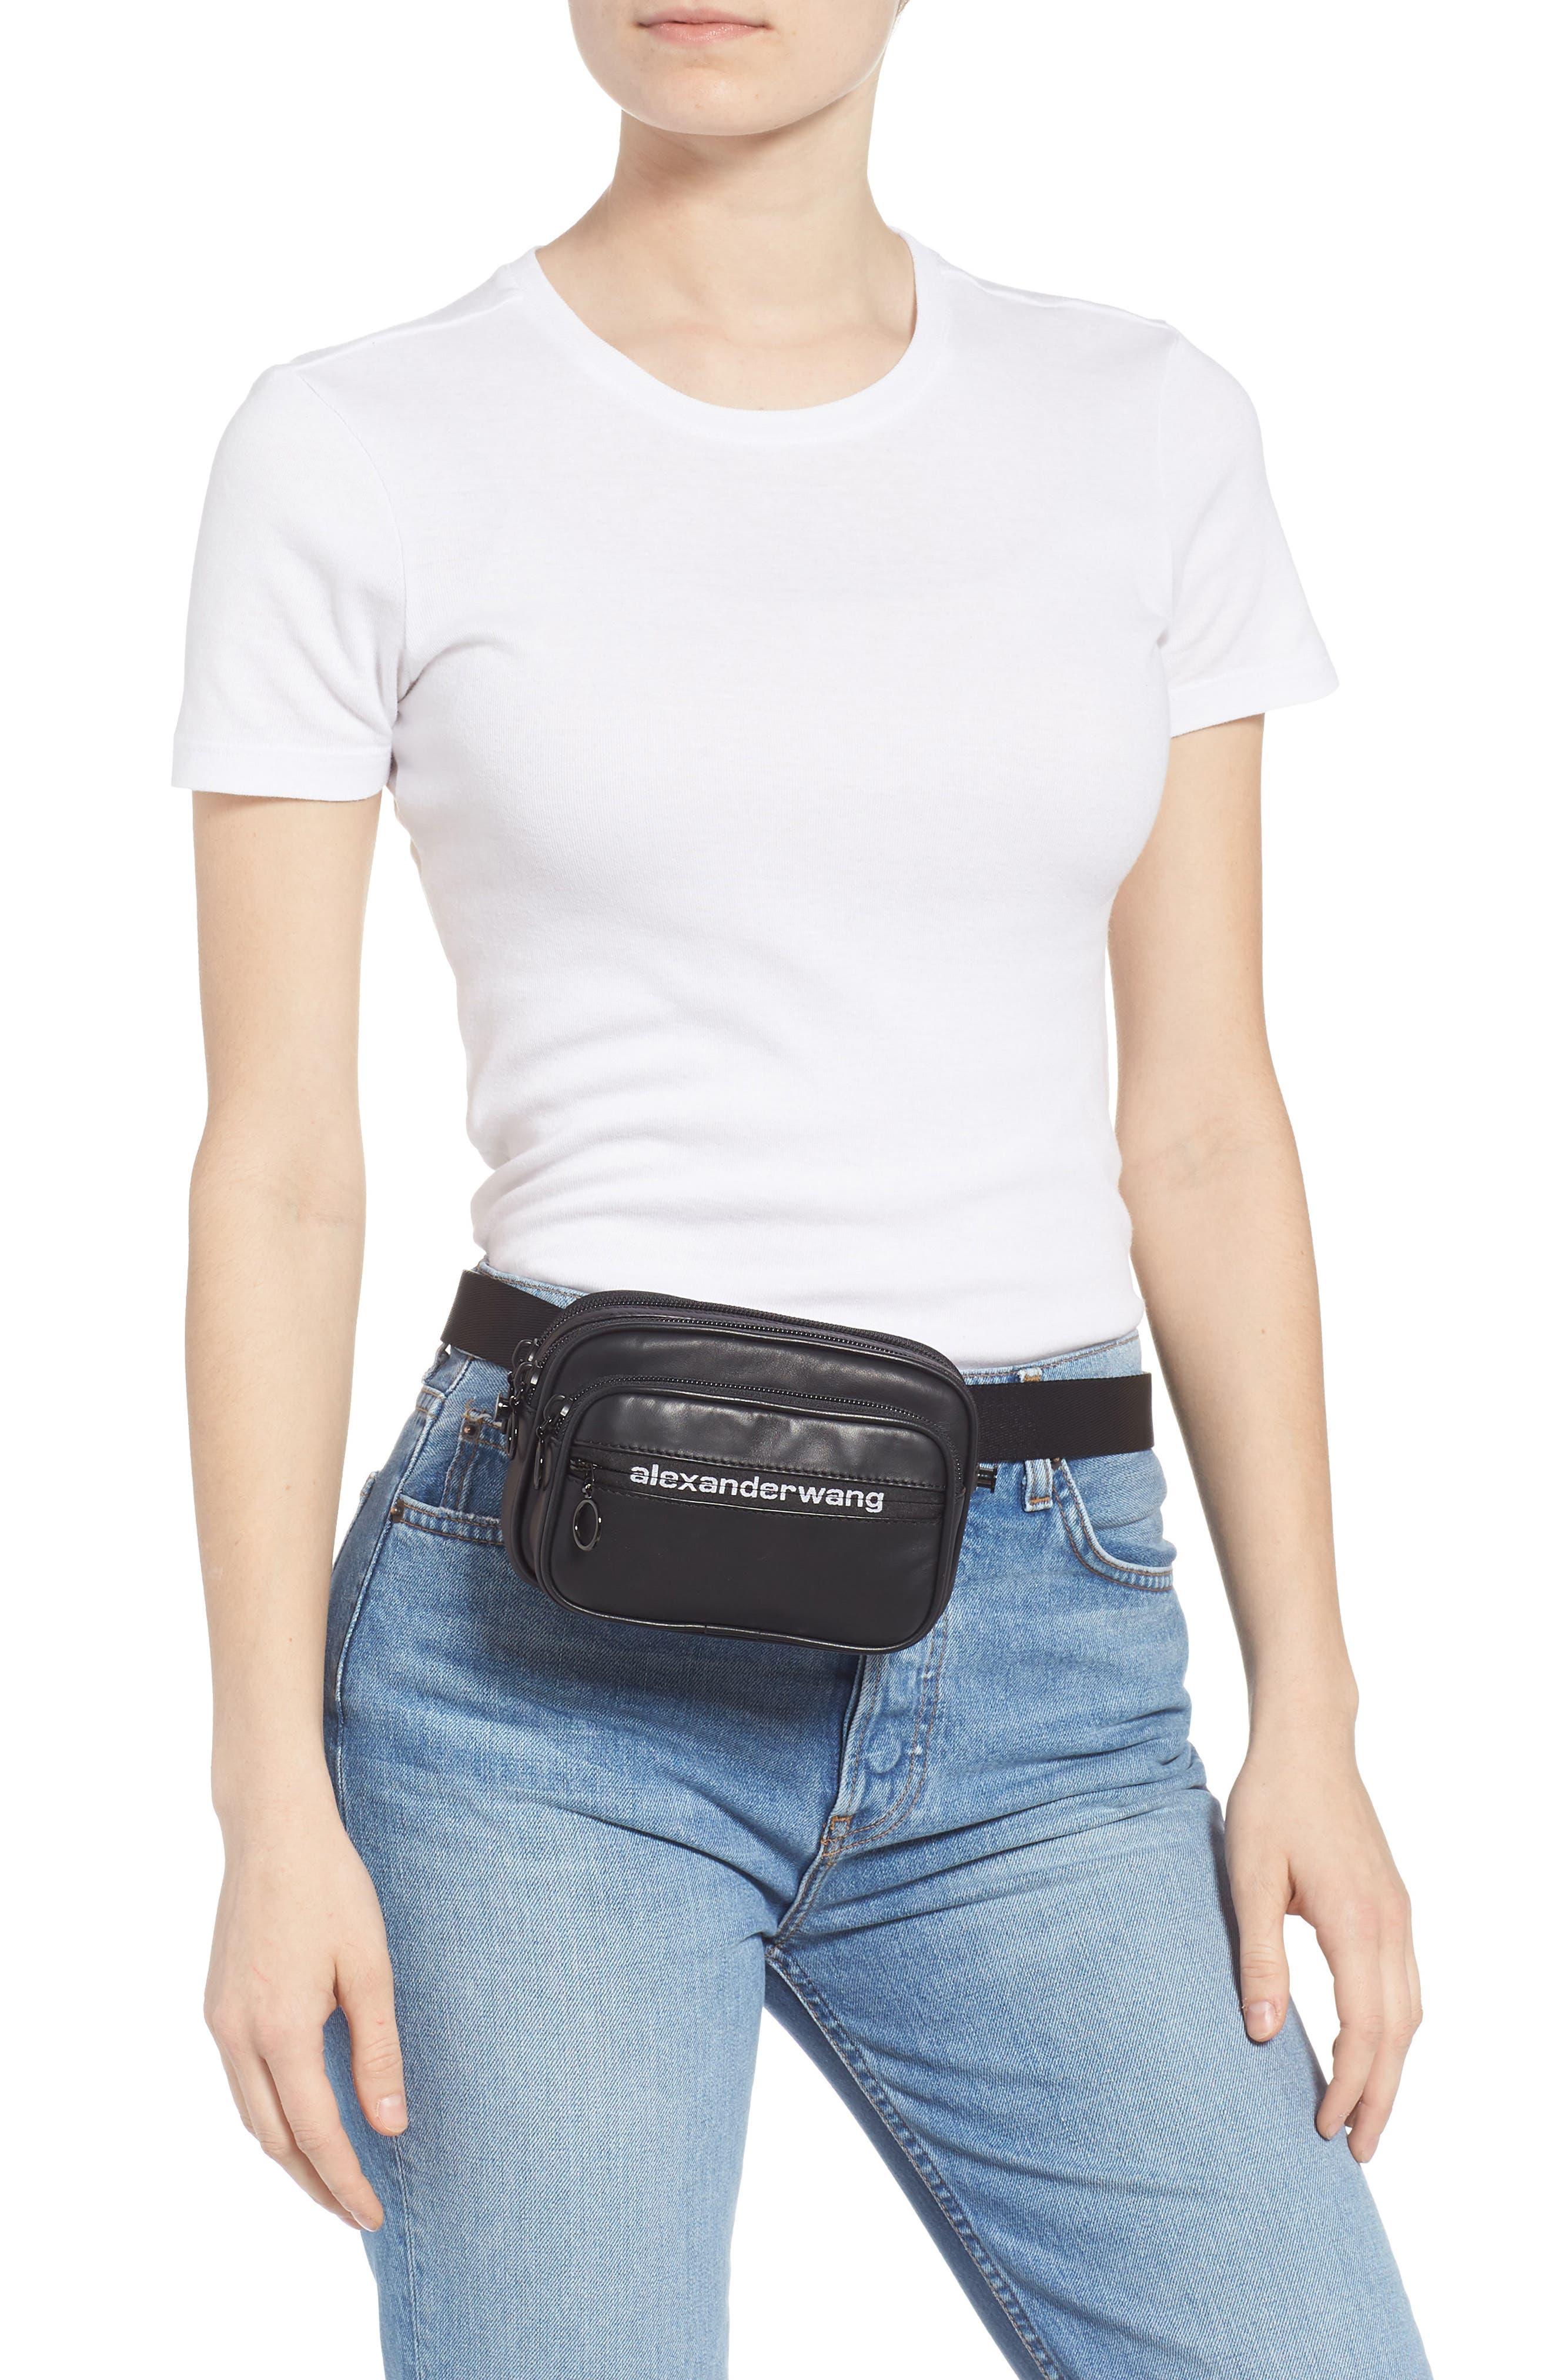 ALEXANDER WANG, Attica Logo Leather Belt Bag, Alternate thumbnail 4, color, BLACK